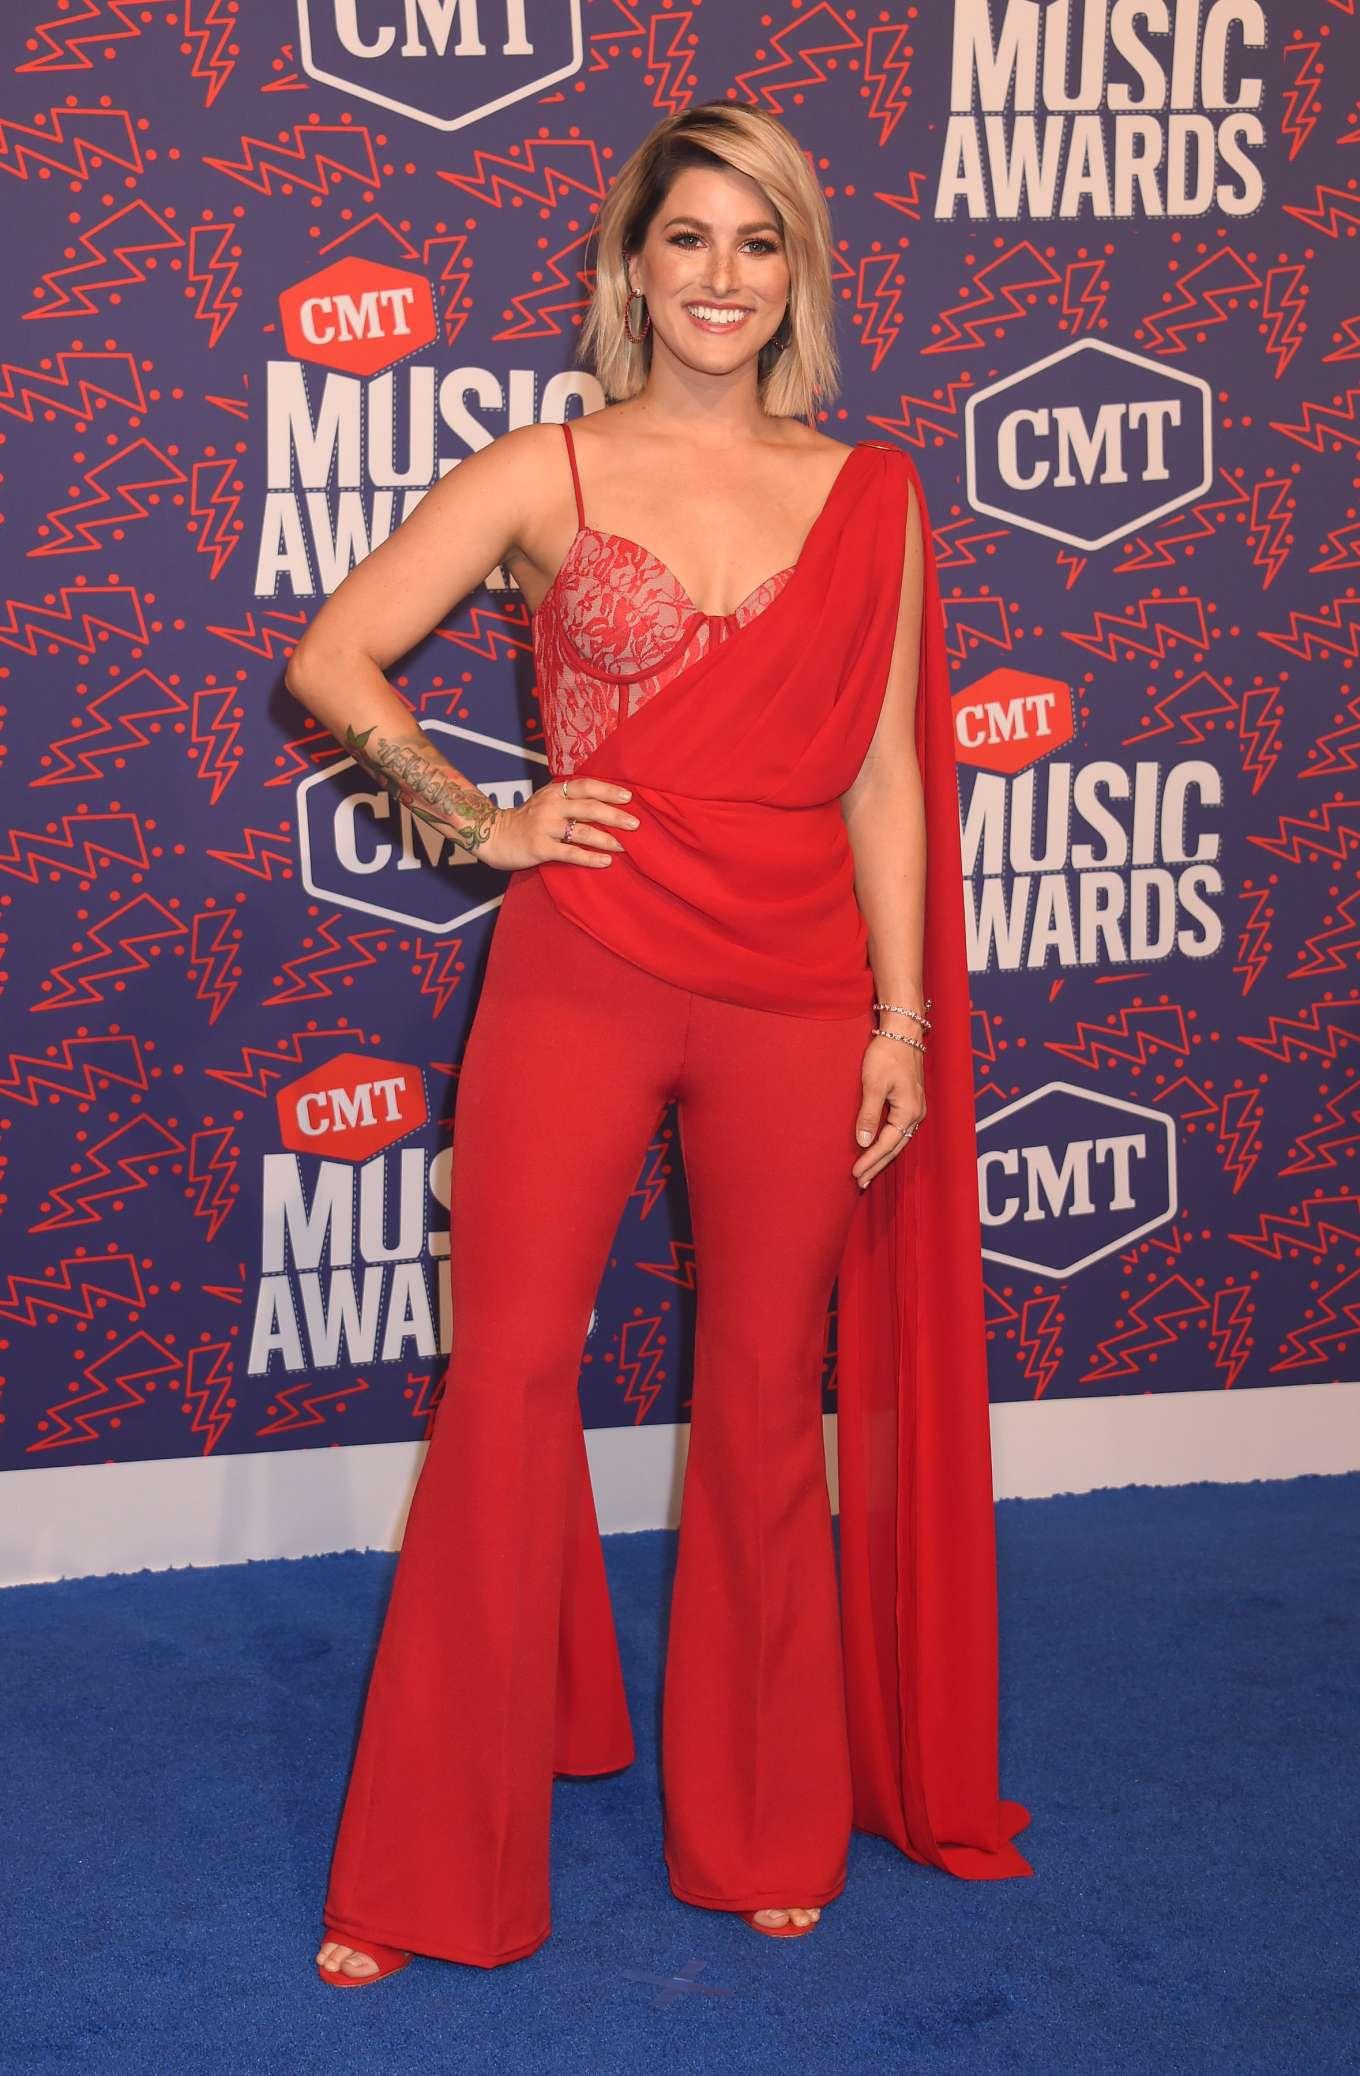 Cassadee Pope 2019 : Cassadee Pope: 2019 CMT Music Awards-08